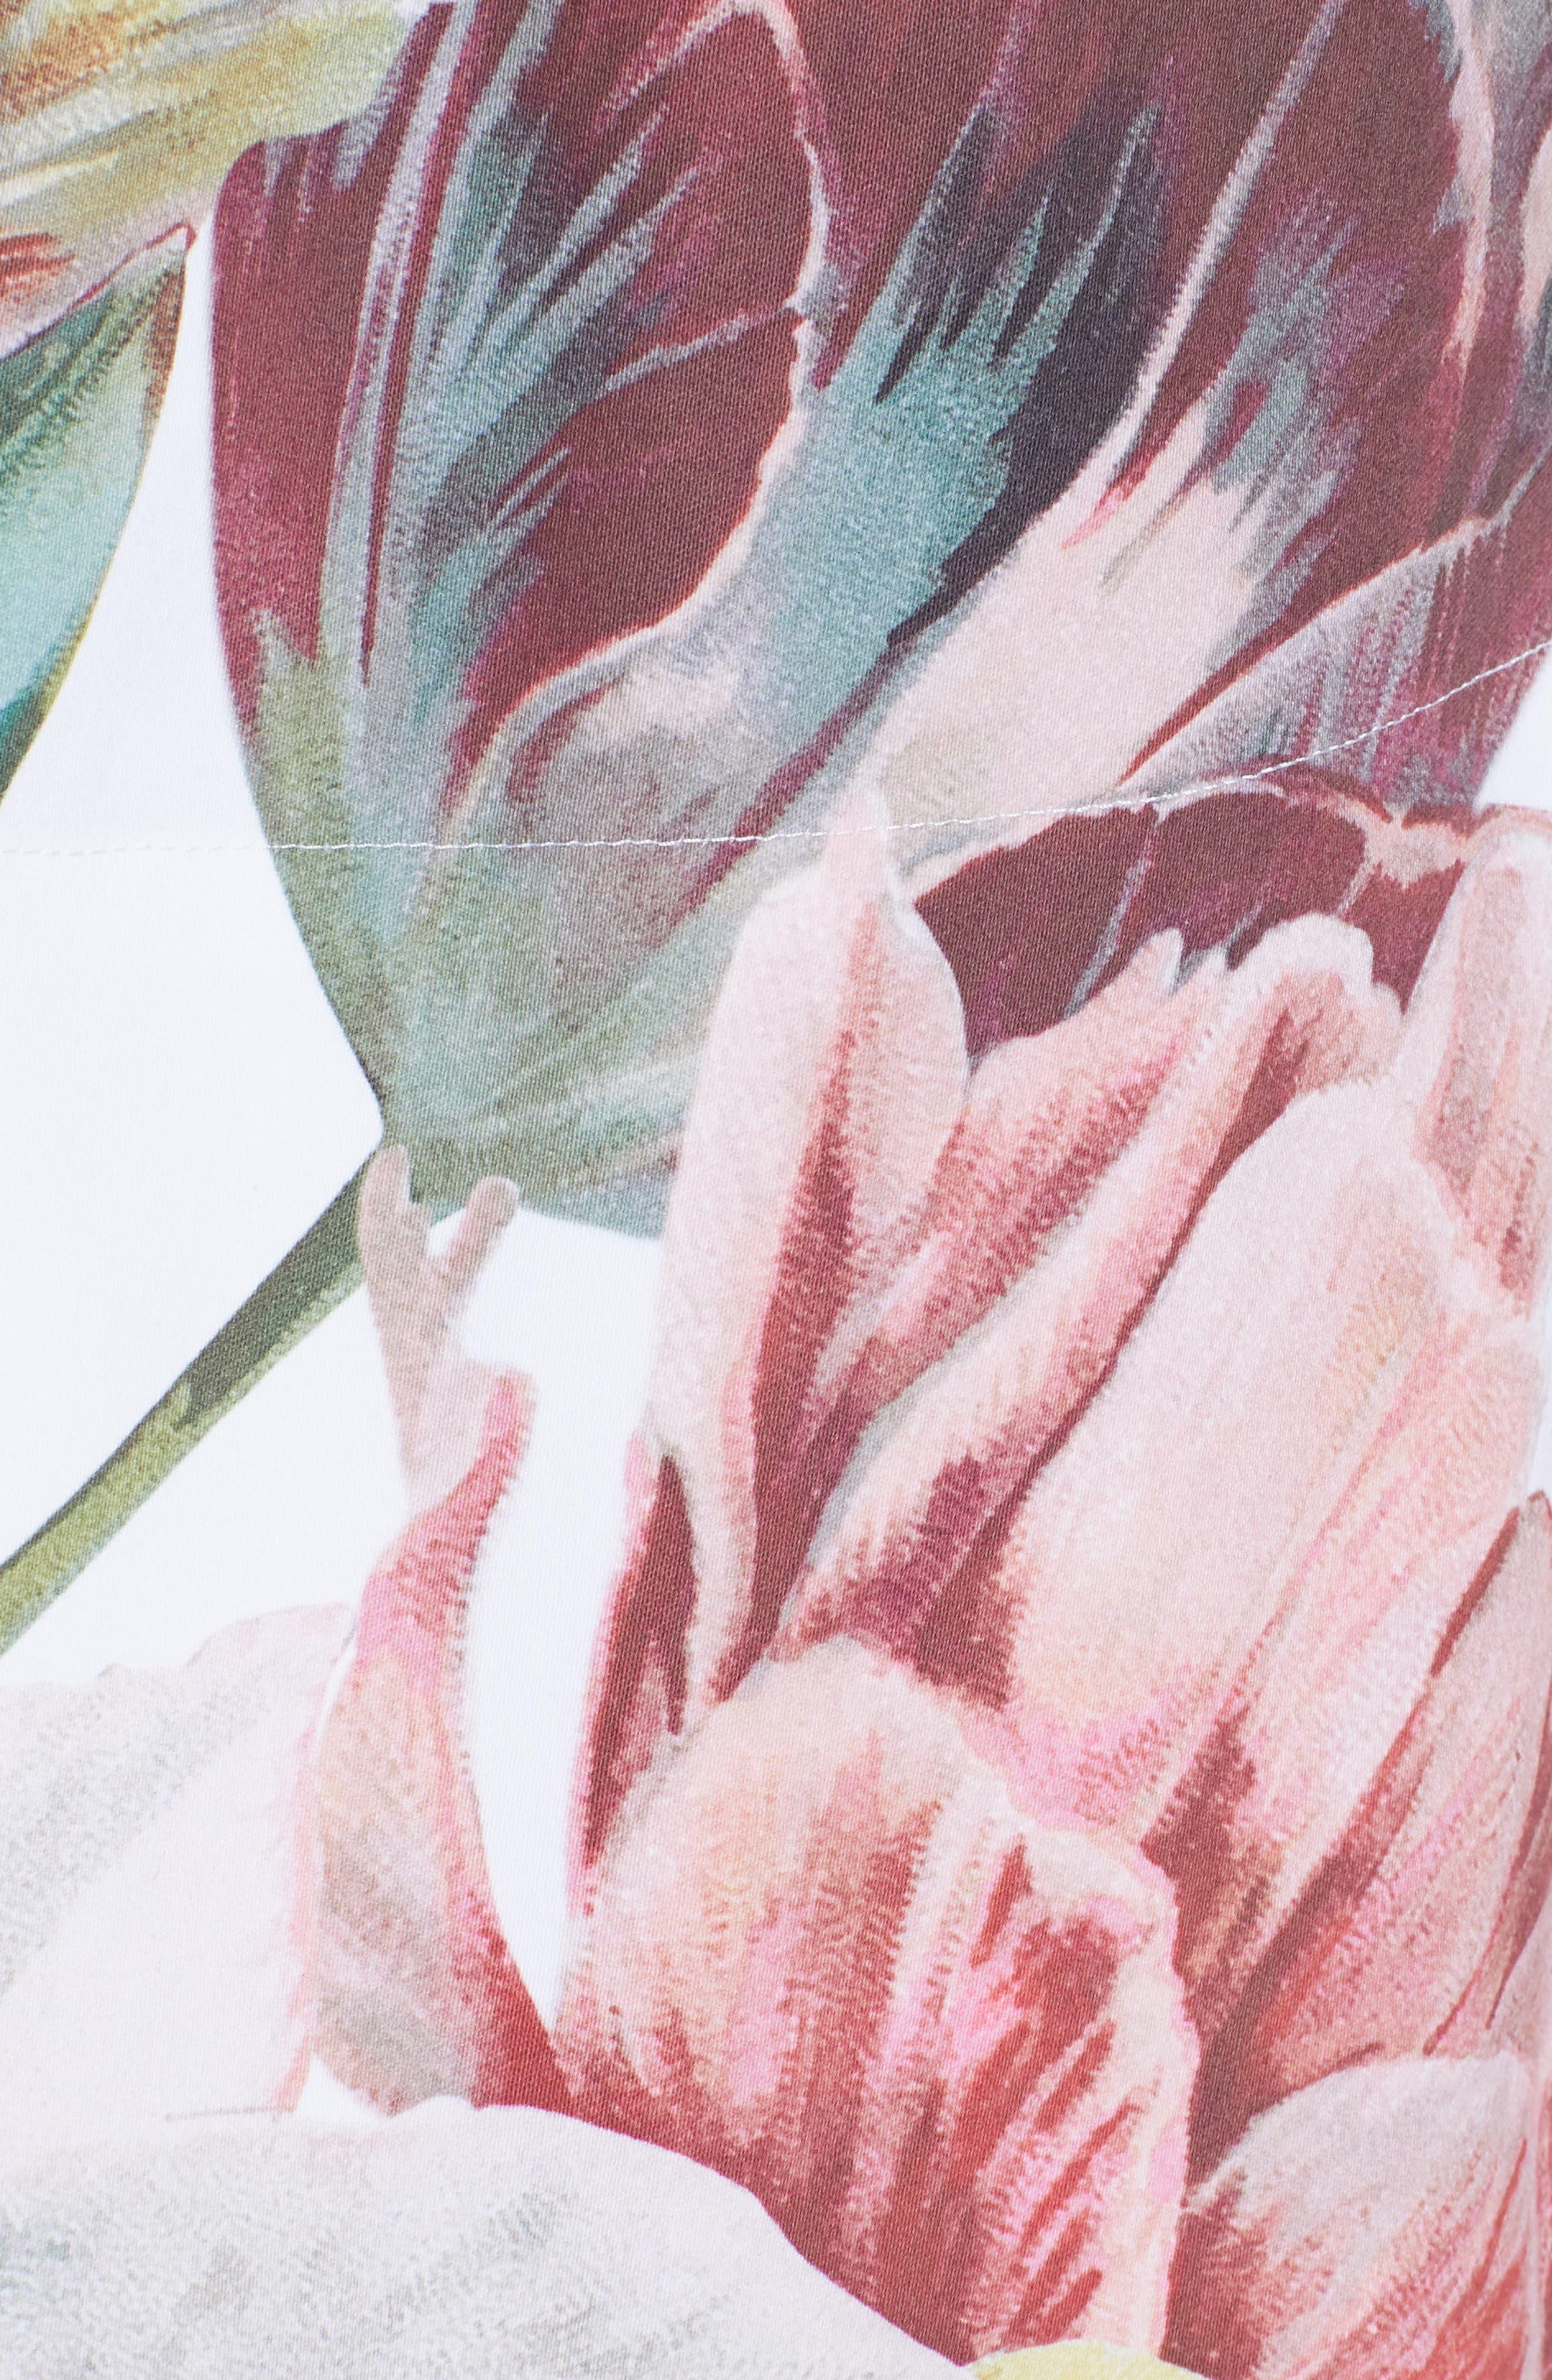 Tranquility Stretch Cotton Dress,                             Alternate thumbnail 5, color,                             110